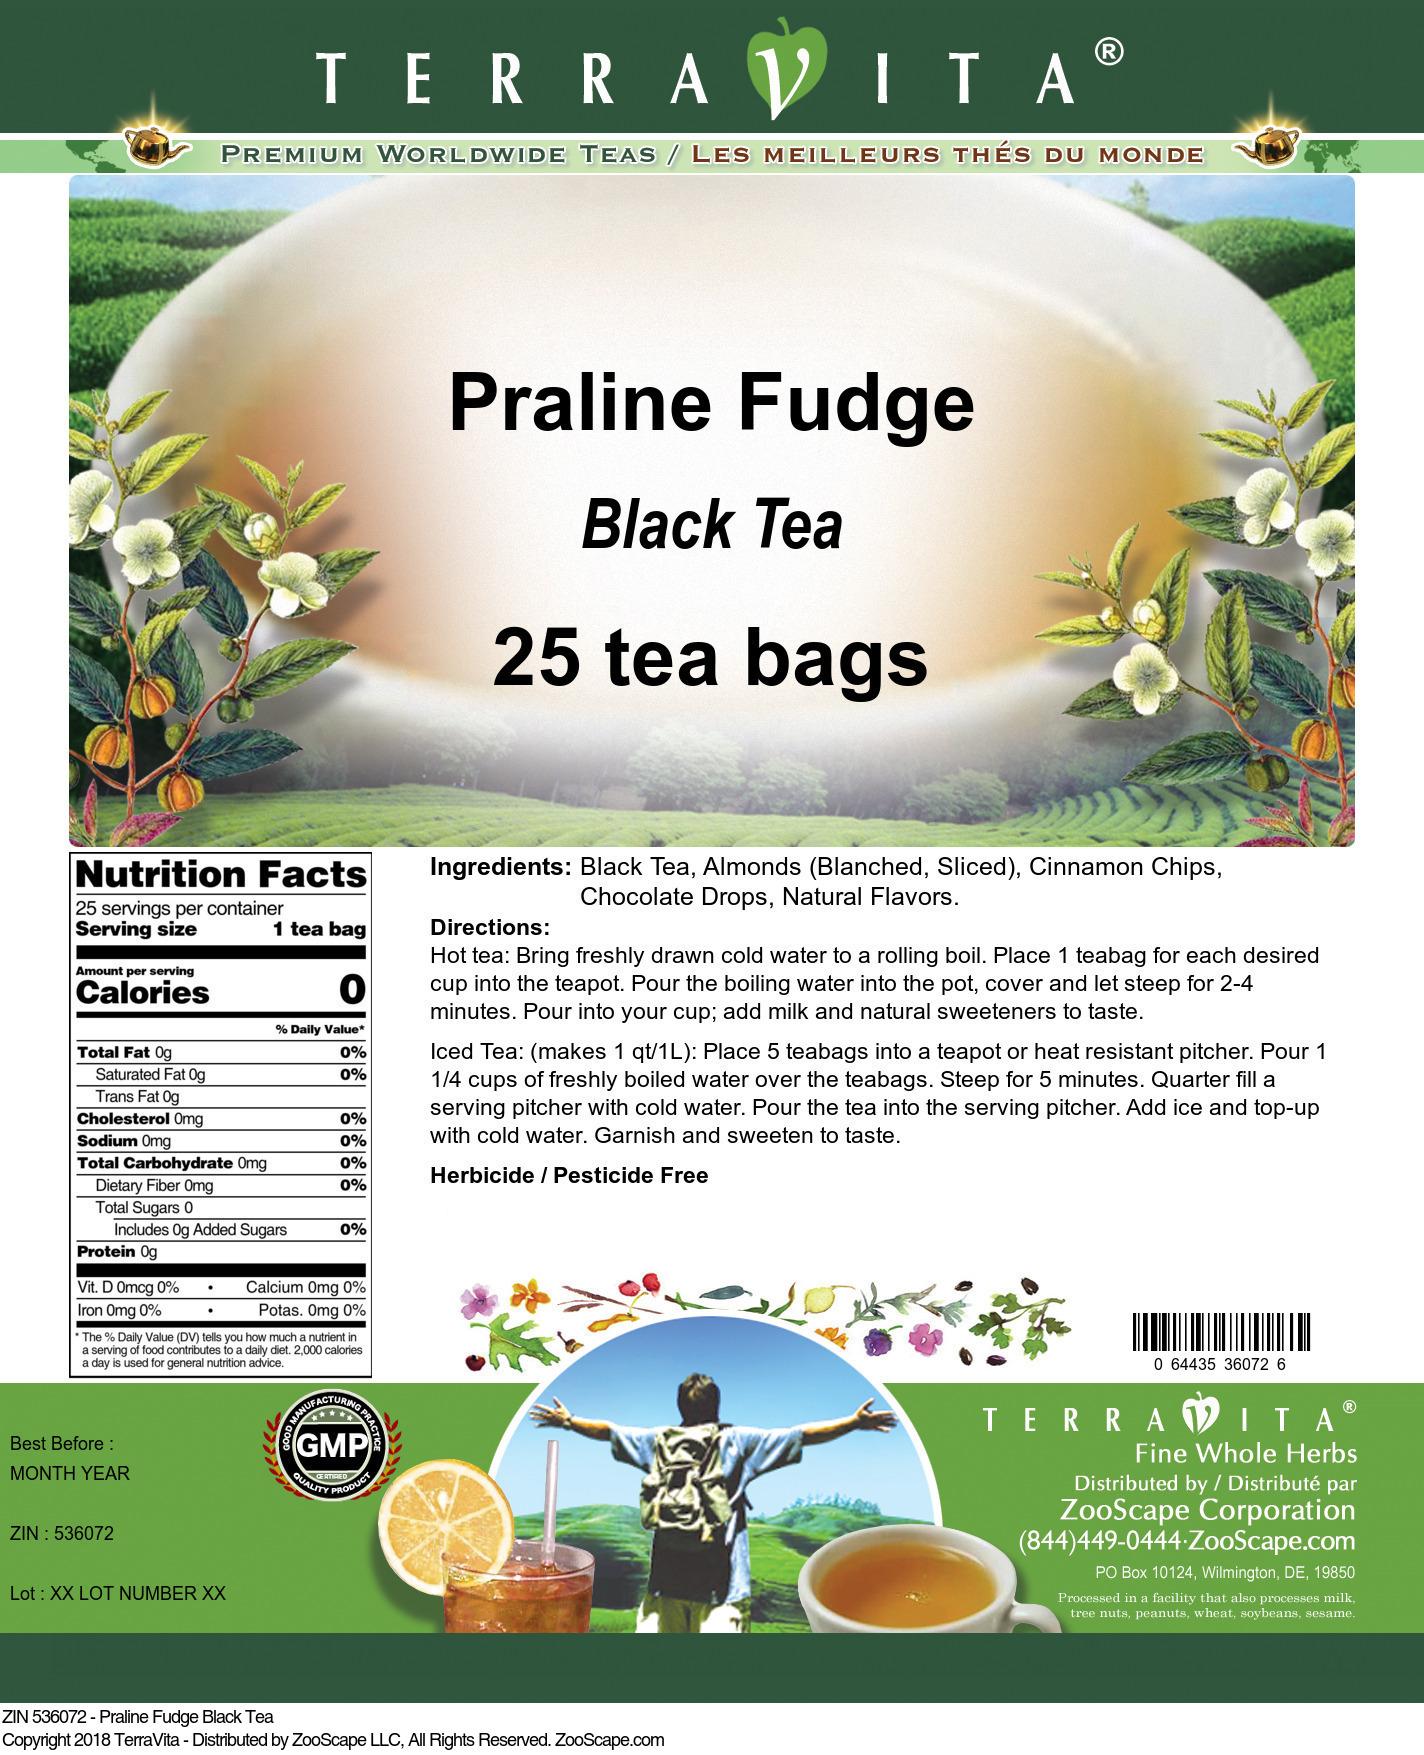 Praline Fudge Black Tea